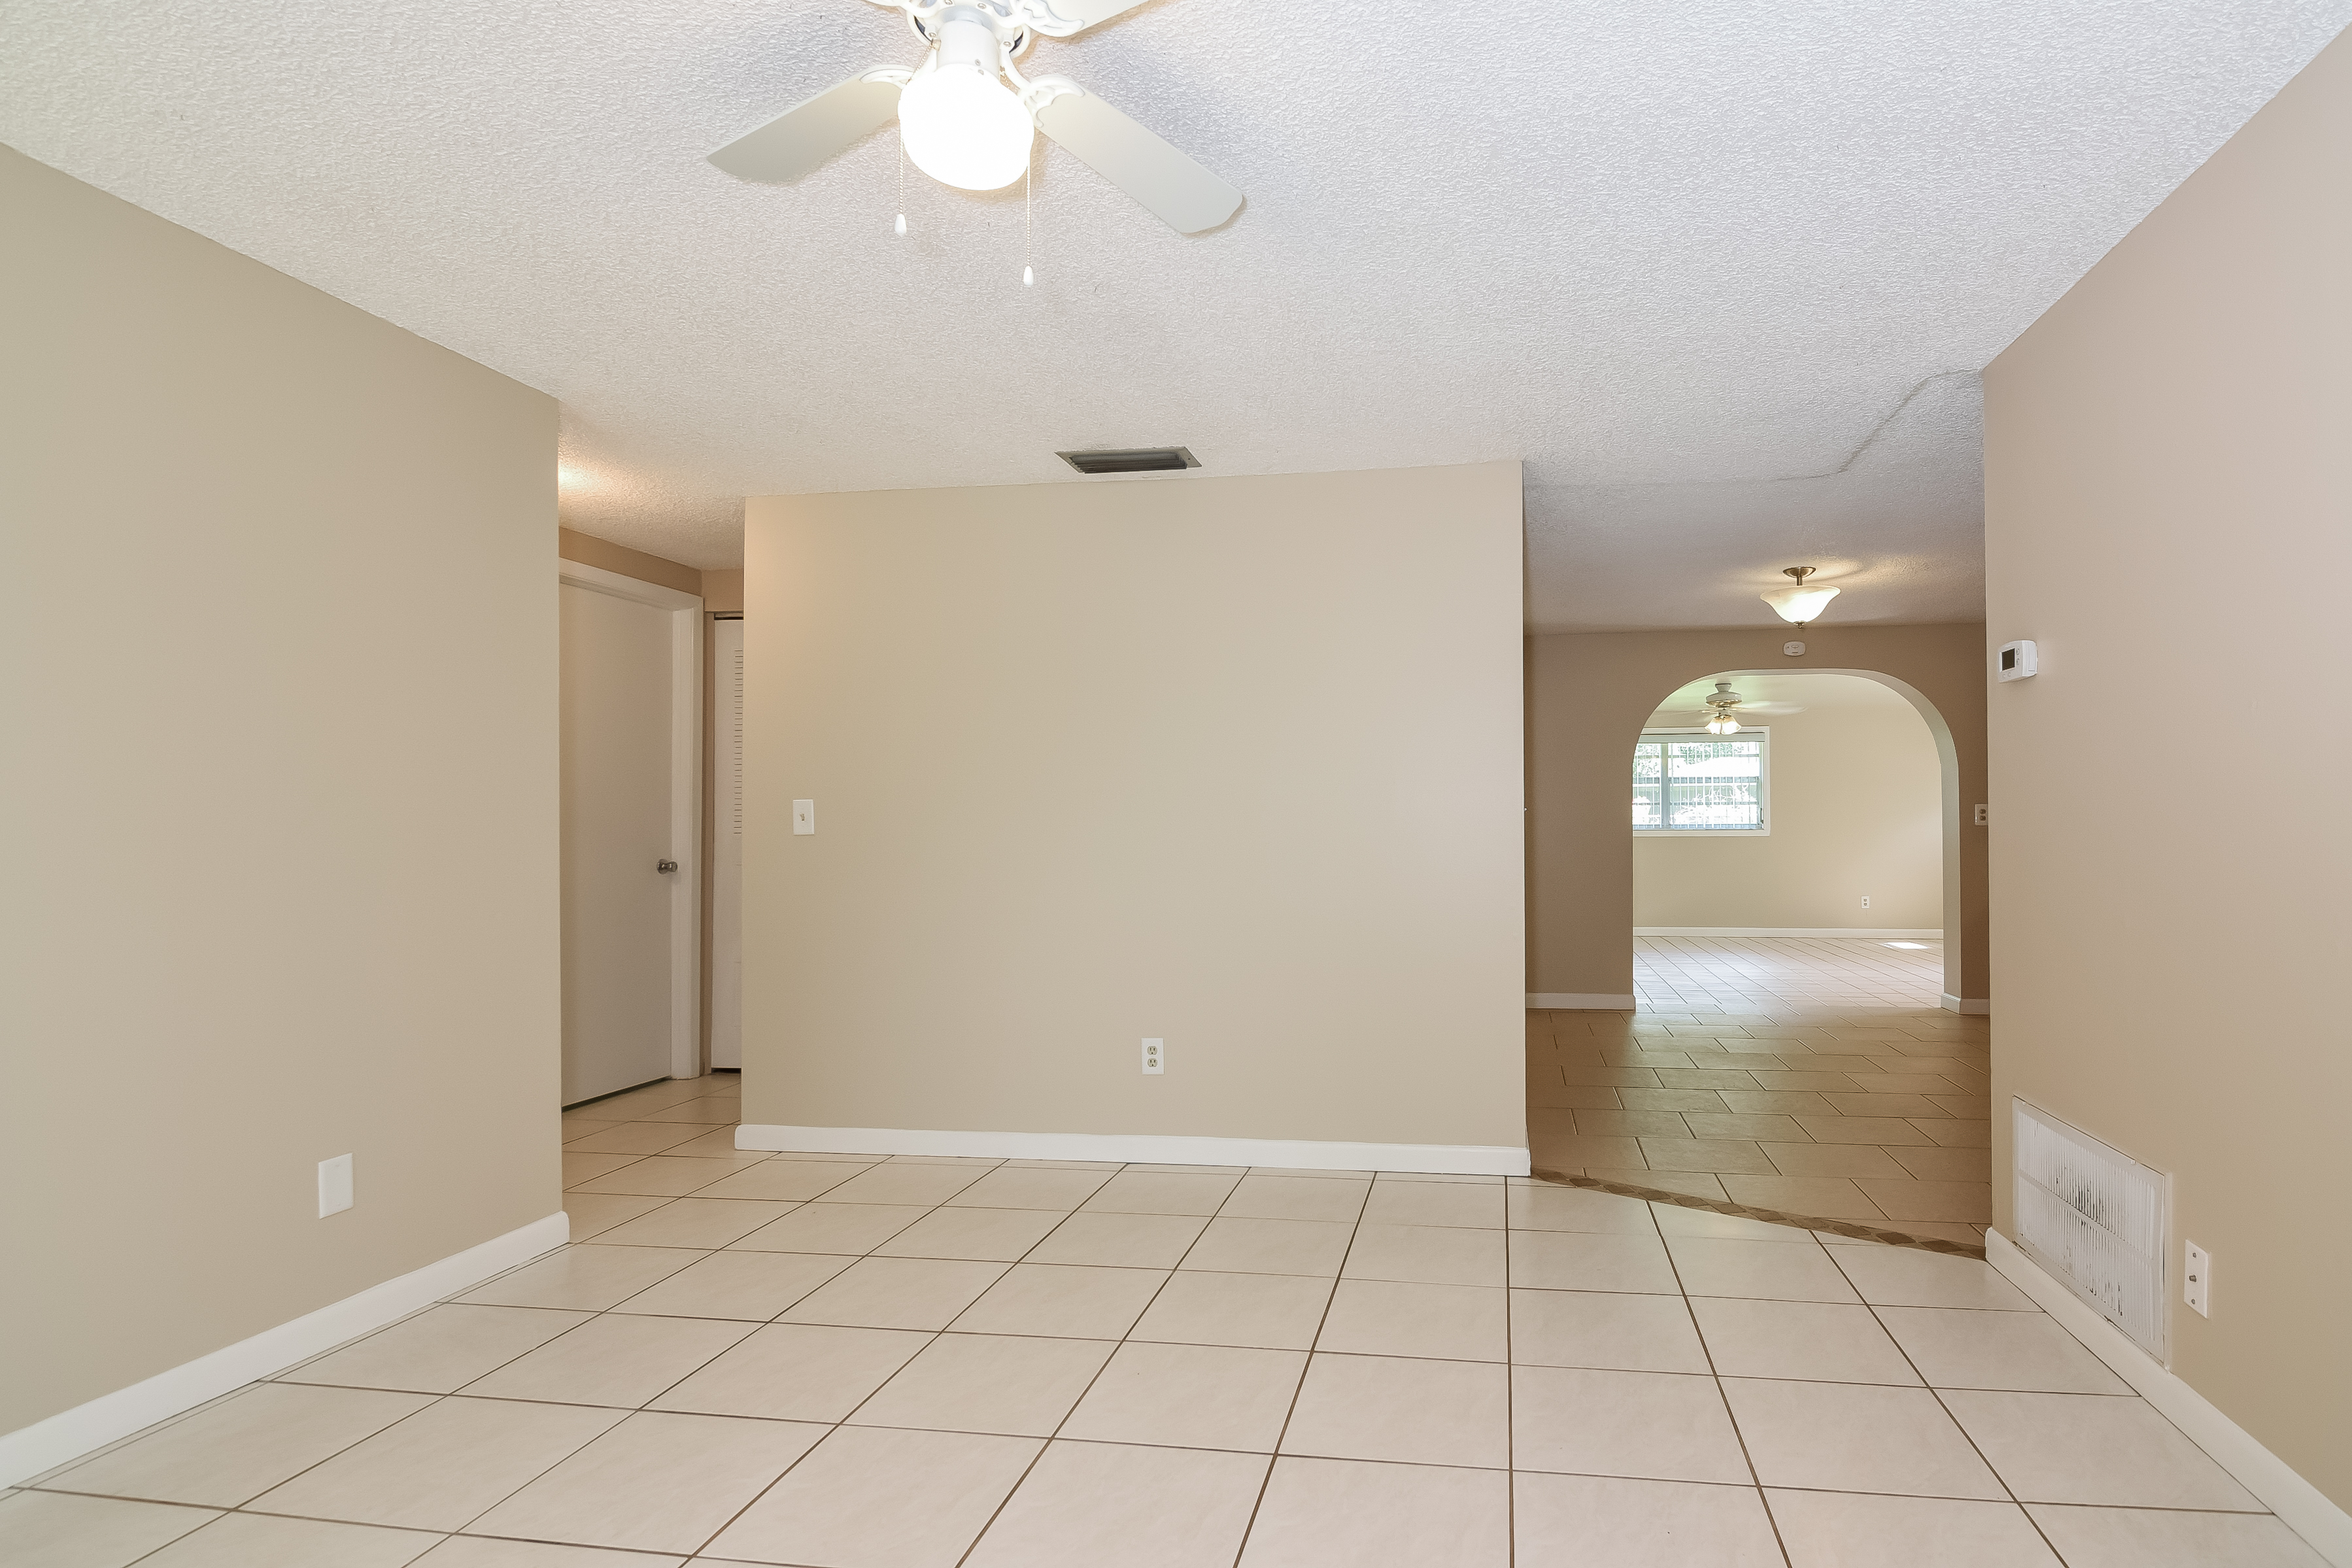 Photo of 808 Falkirk Ave, Valrico, FL, 33594